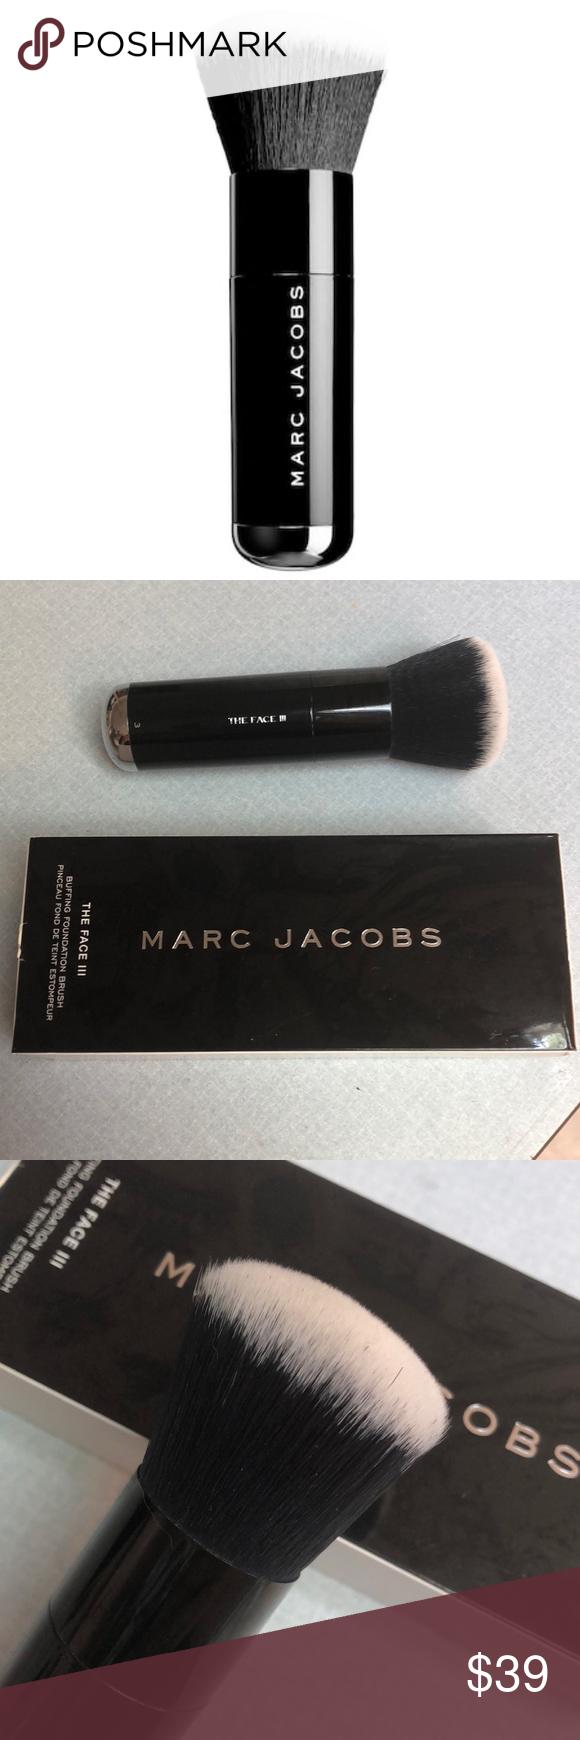 Marc Jacobs The Face III Brush Makeup gift, Makeup tools